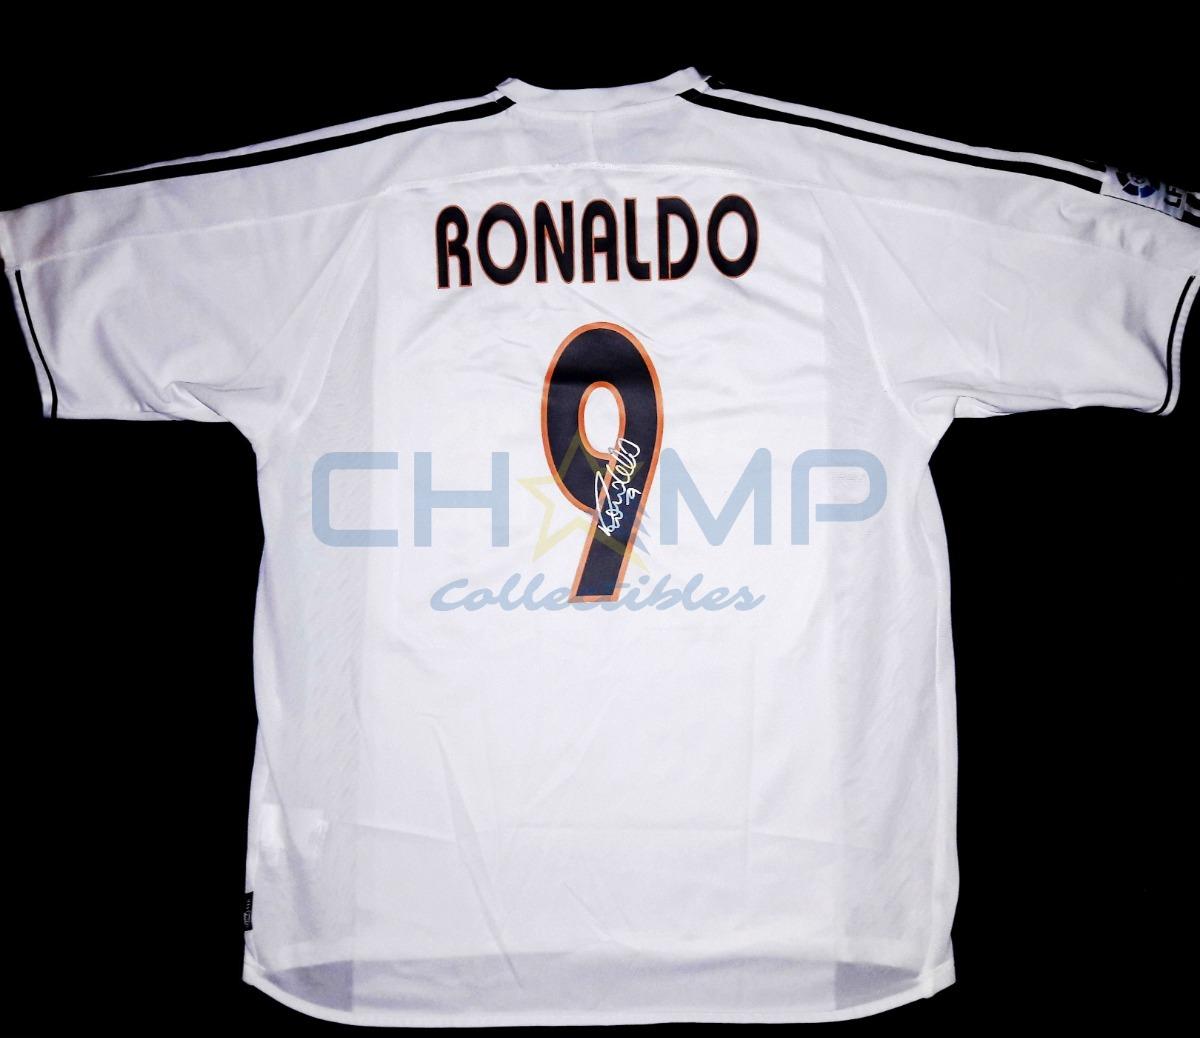 huge selection of b9e2e 8c612 Jersey Firmado Ronaldo Real Madrid Galacticos R9 Autografo